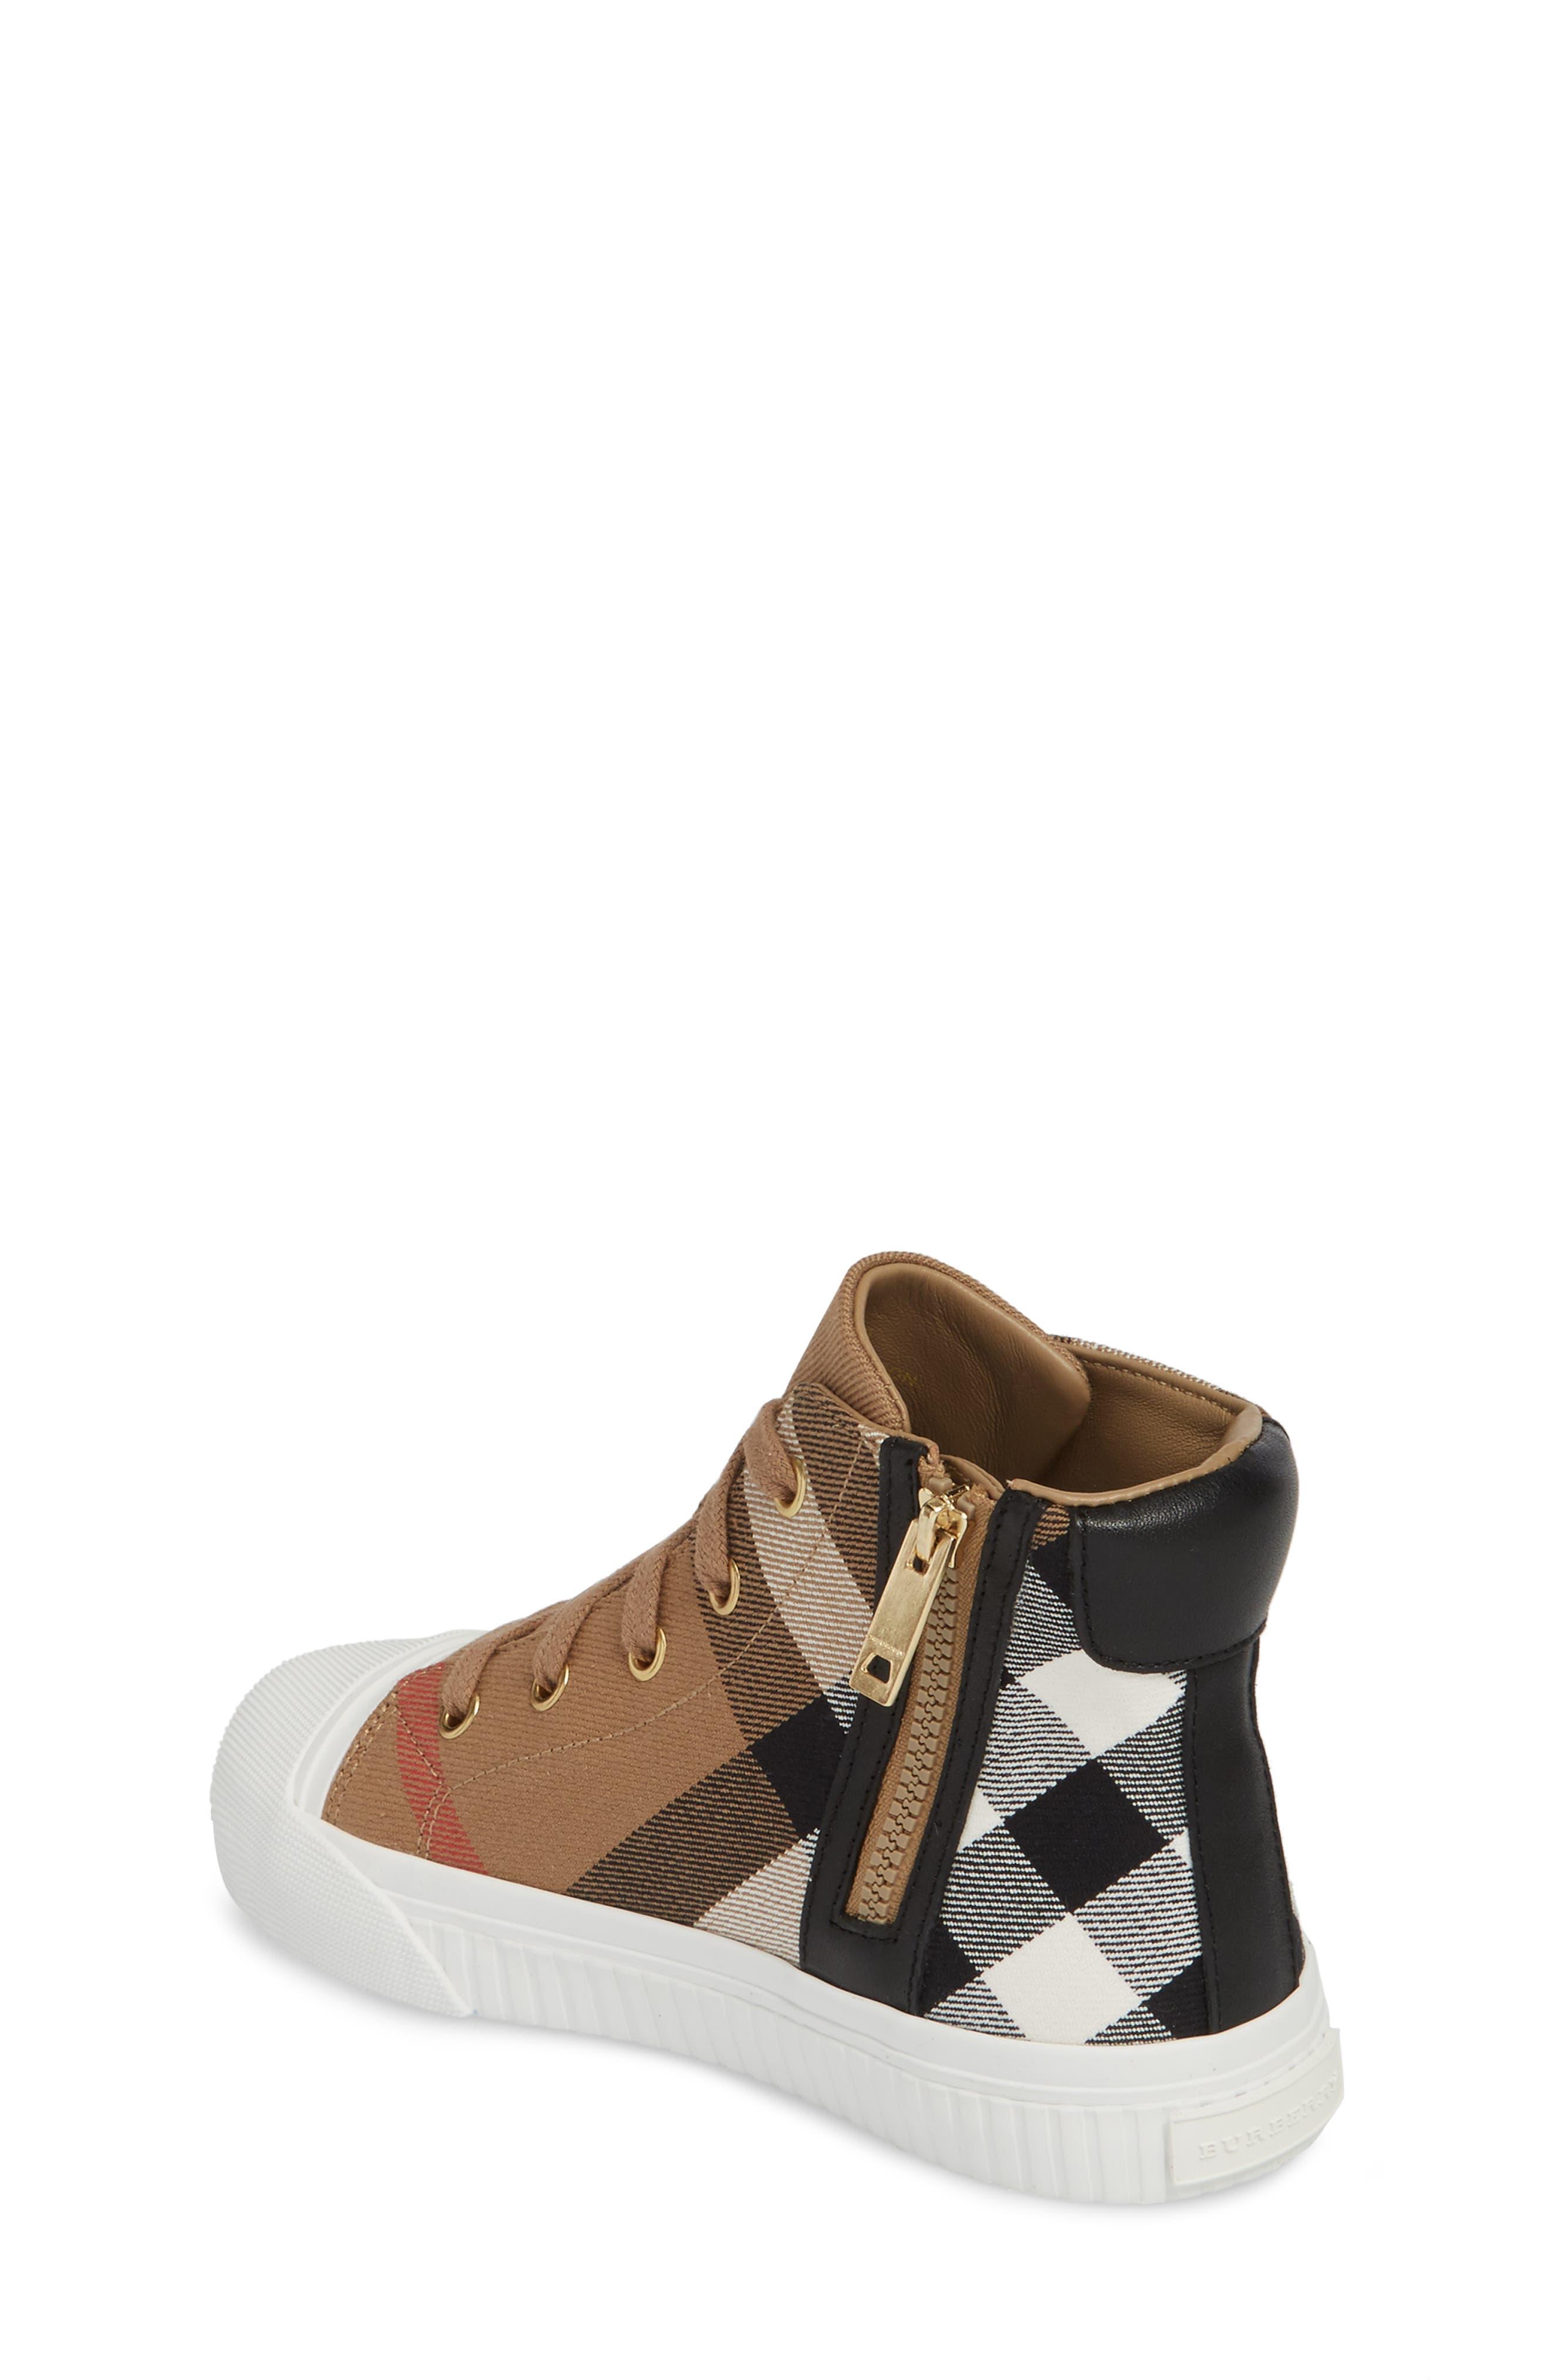 Belford High Top Sneaker,                             Alternate thumbnail 2, color,                             300